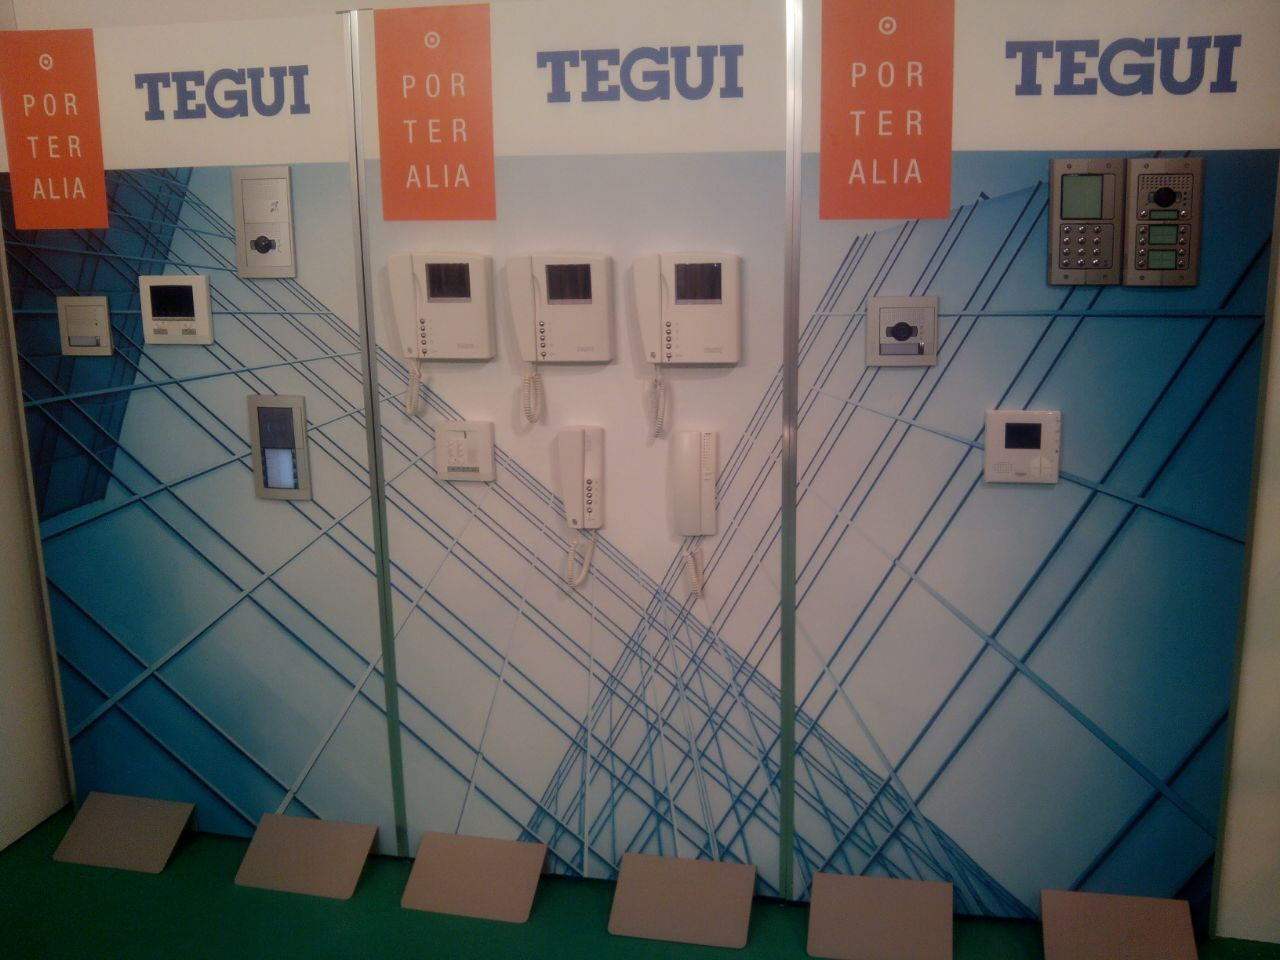 Panel Tegui